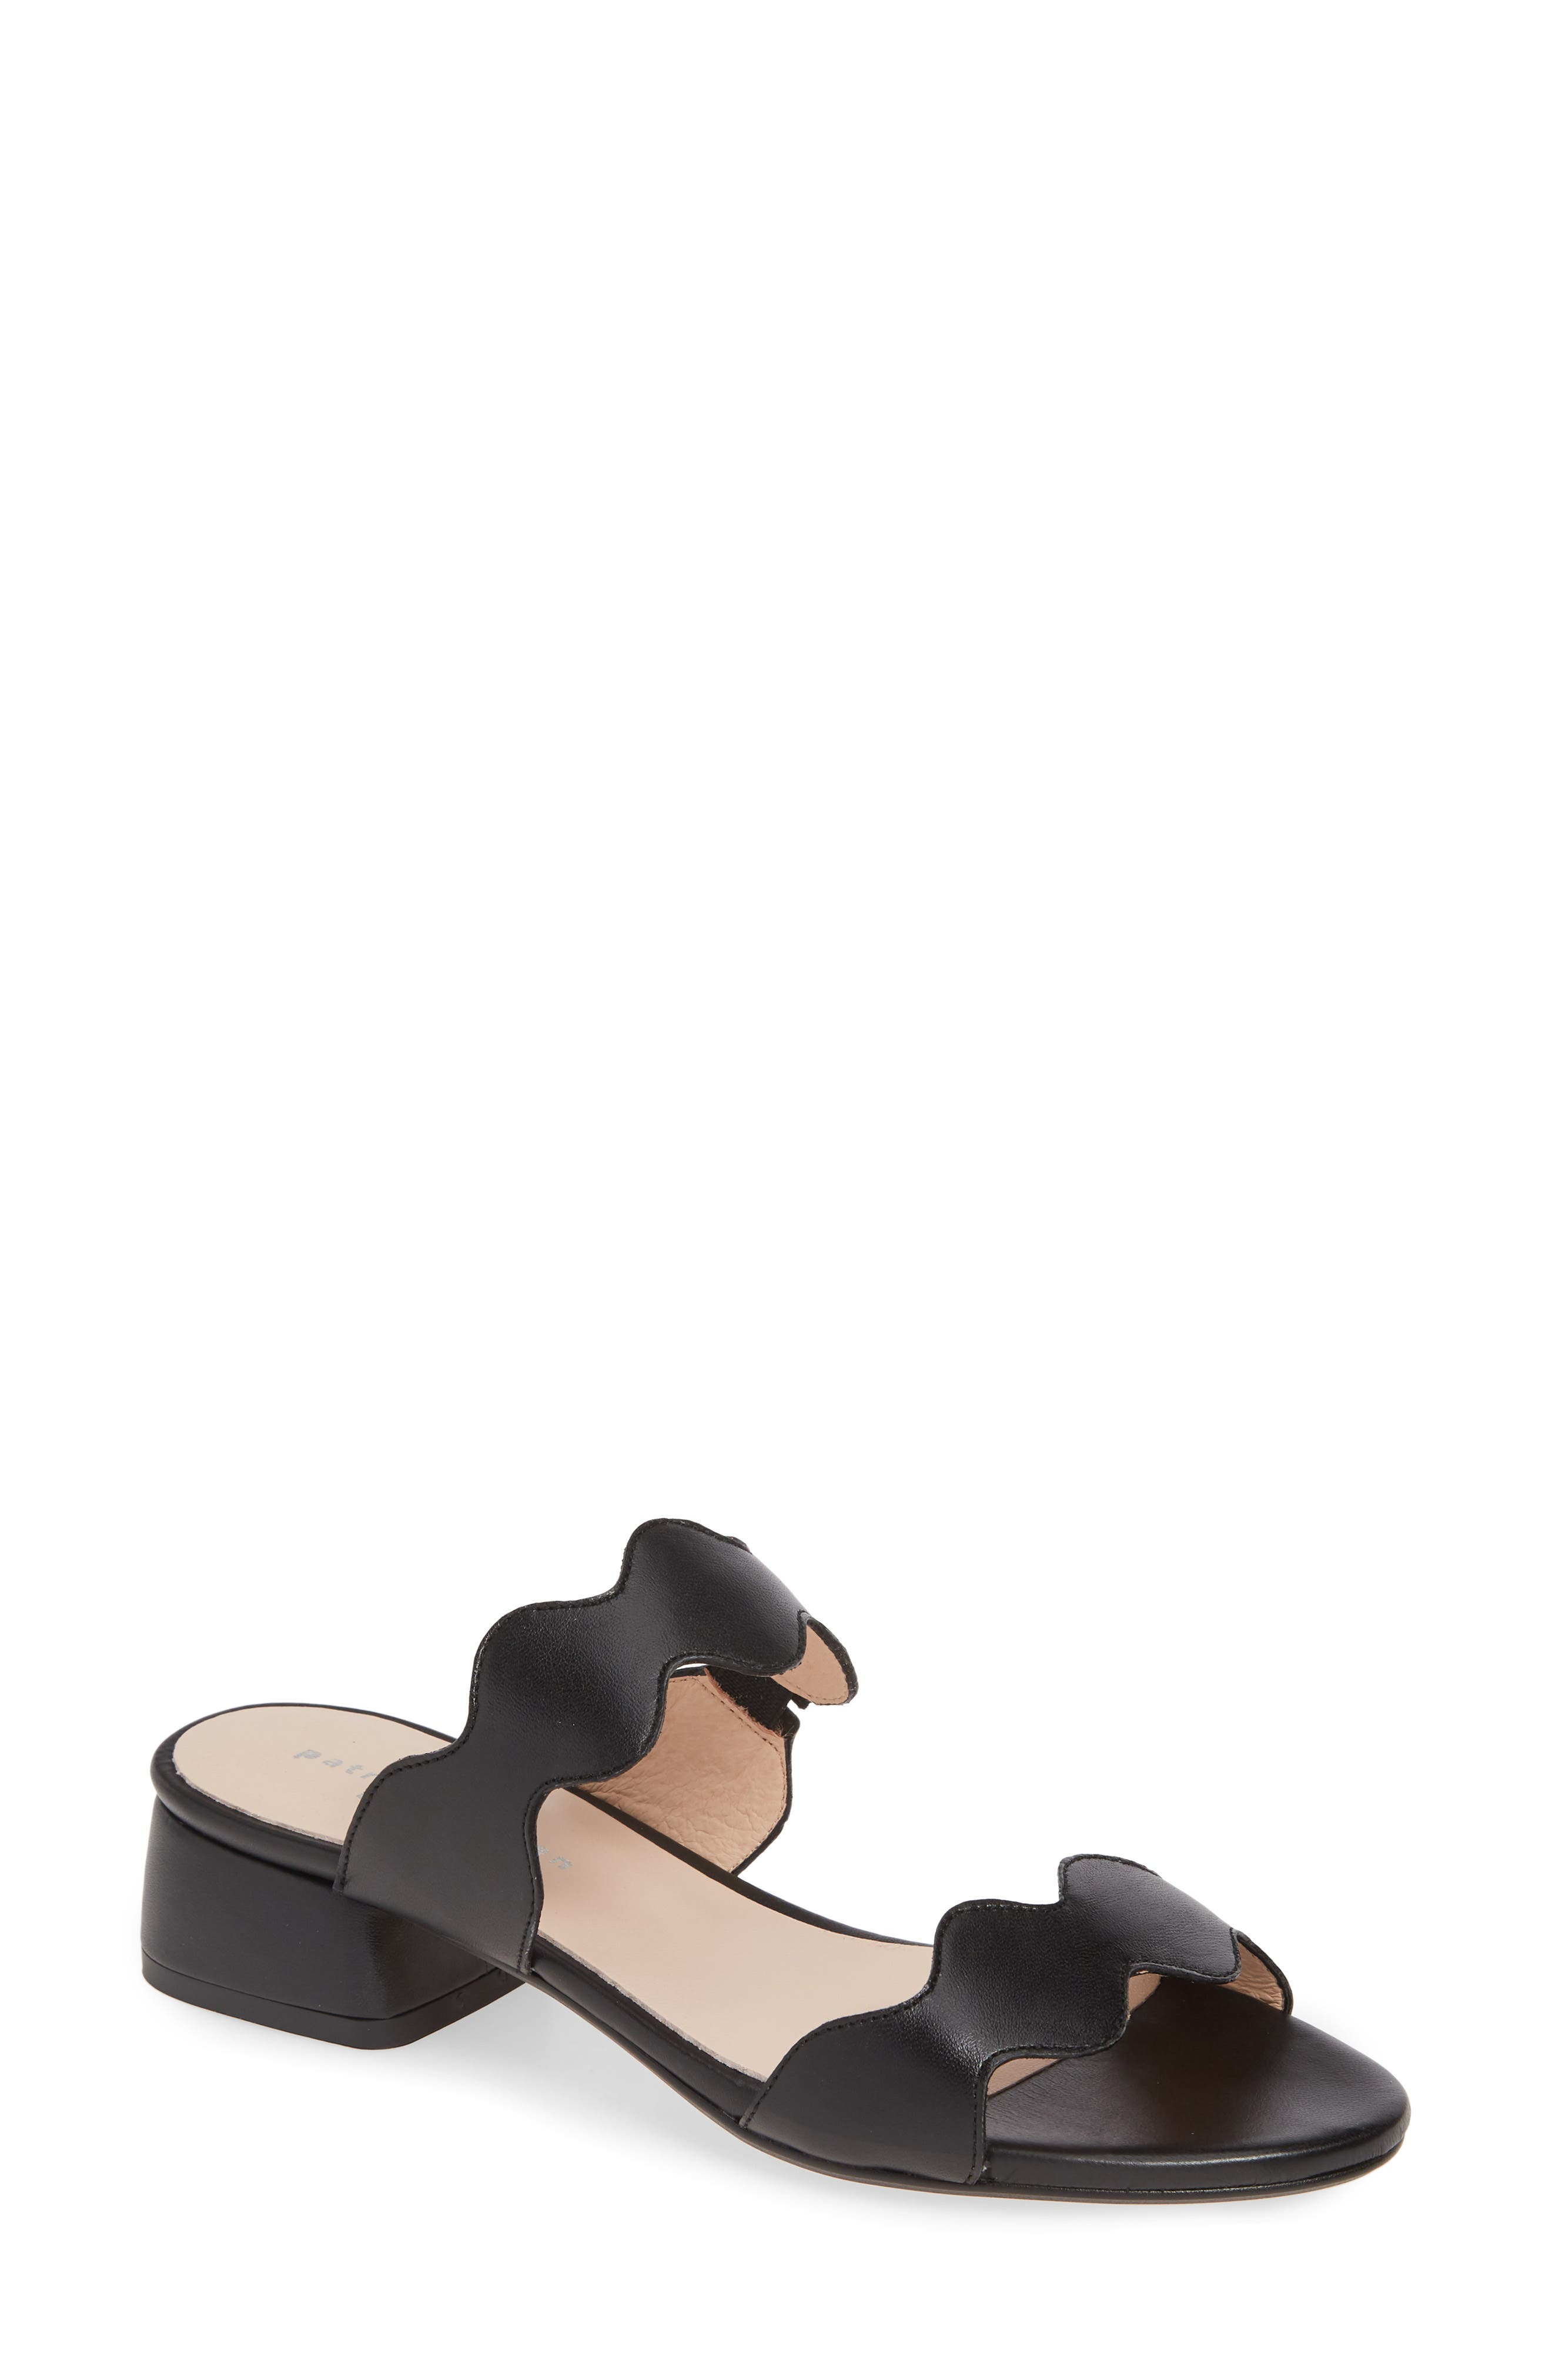 Patricia Green Bali Slide Sandal, Black